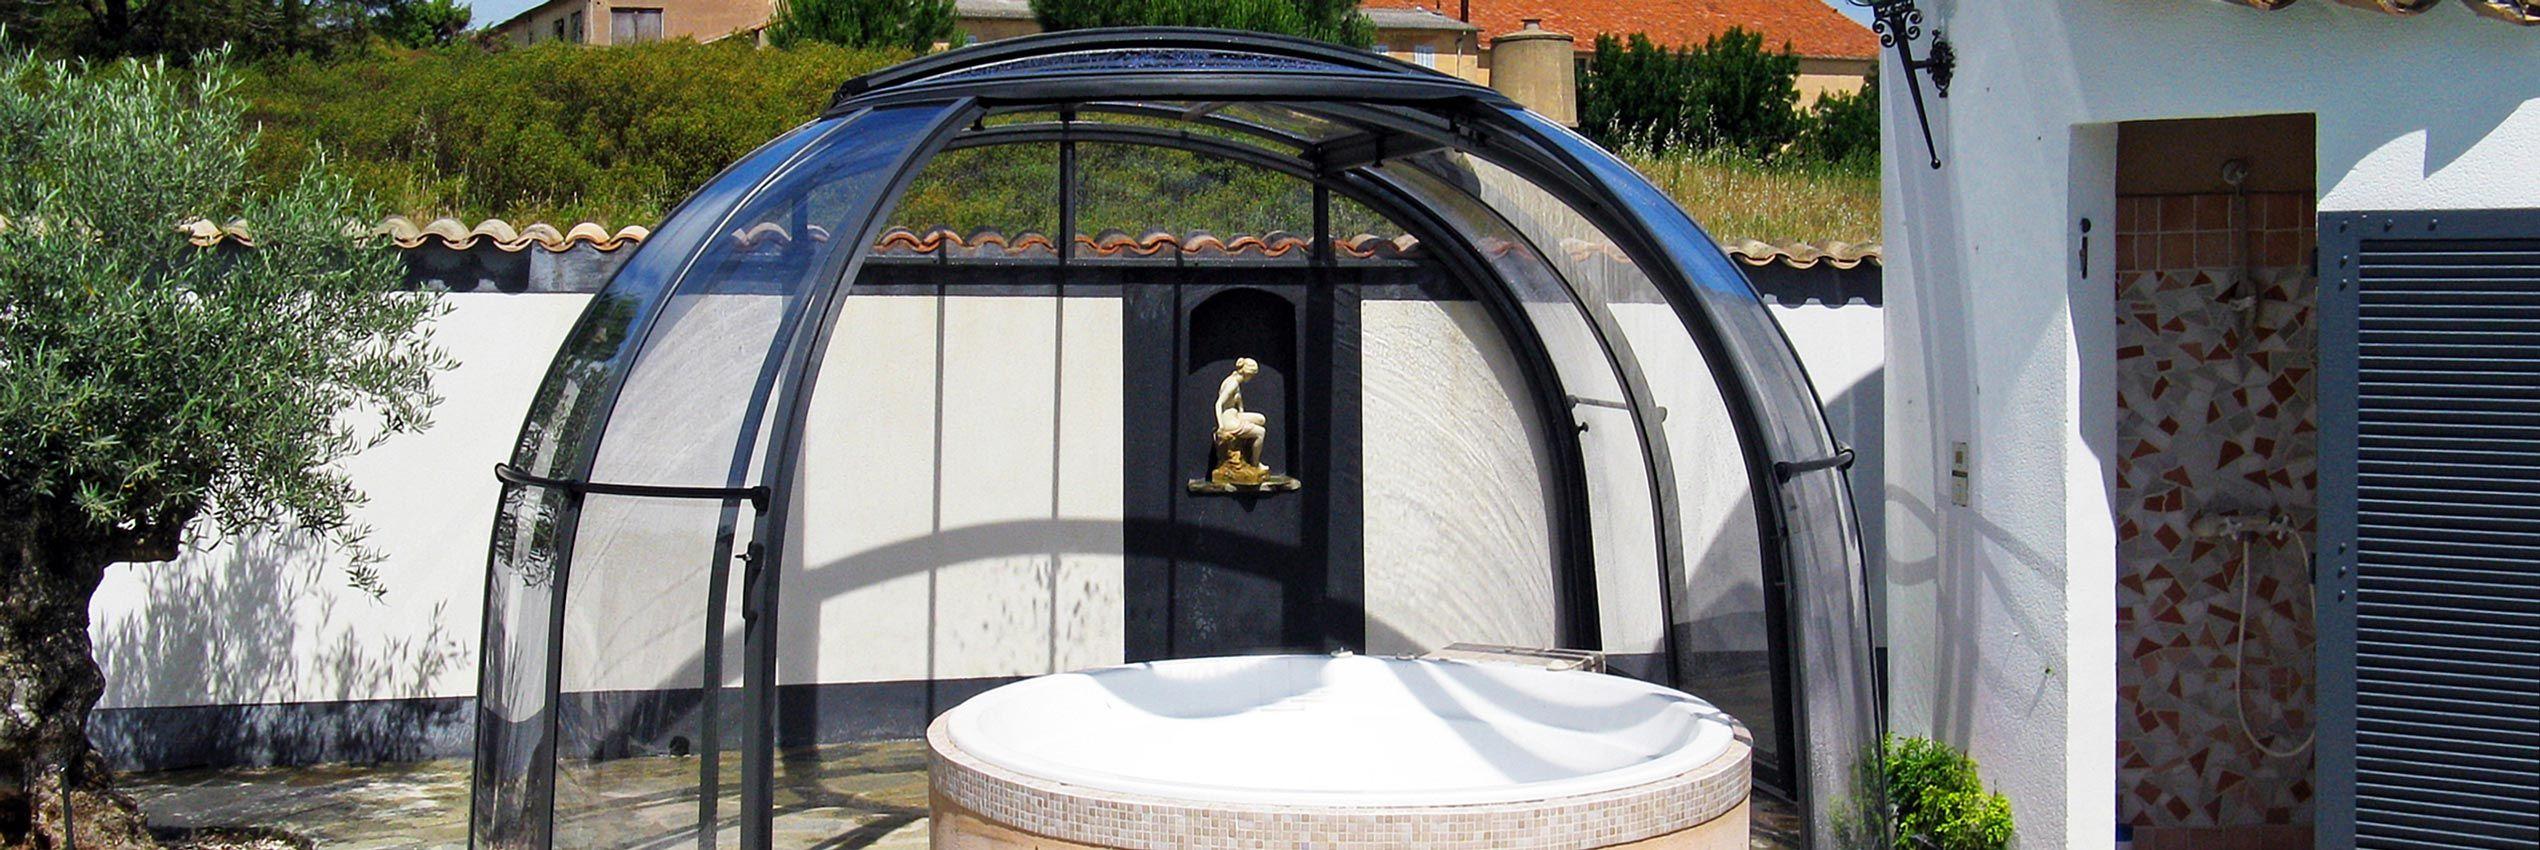 Opened enclosure